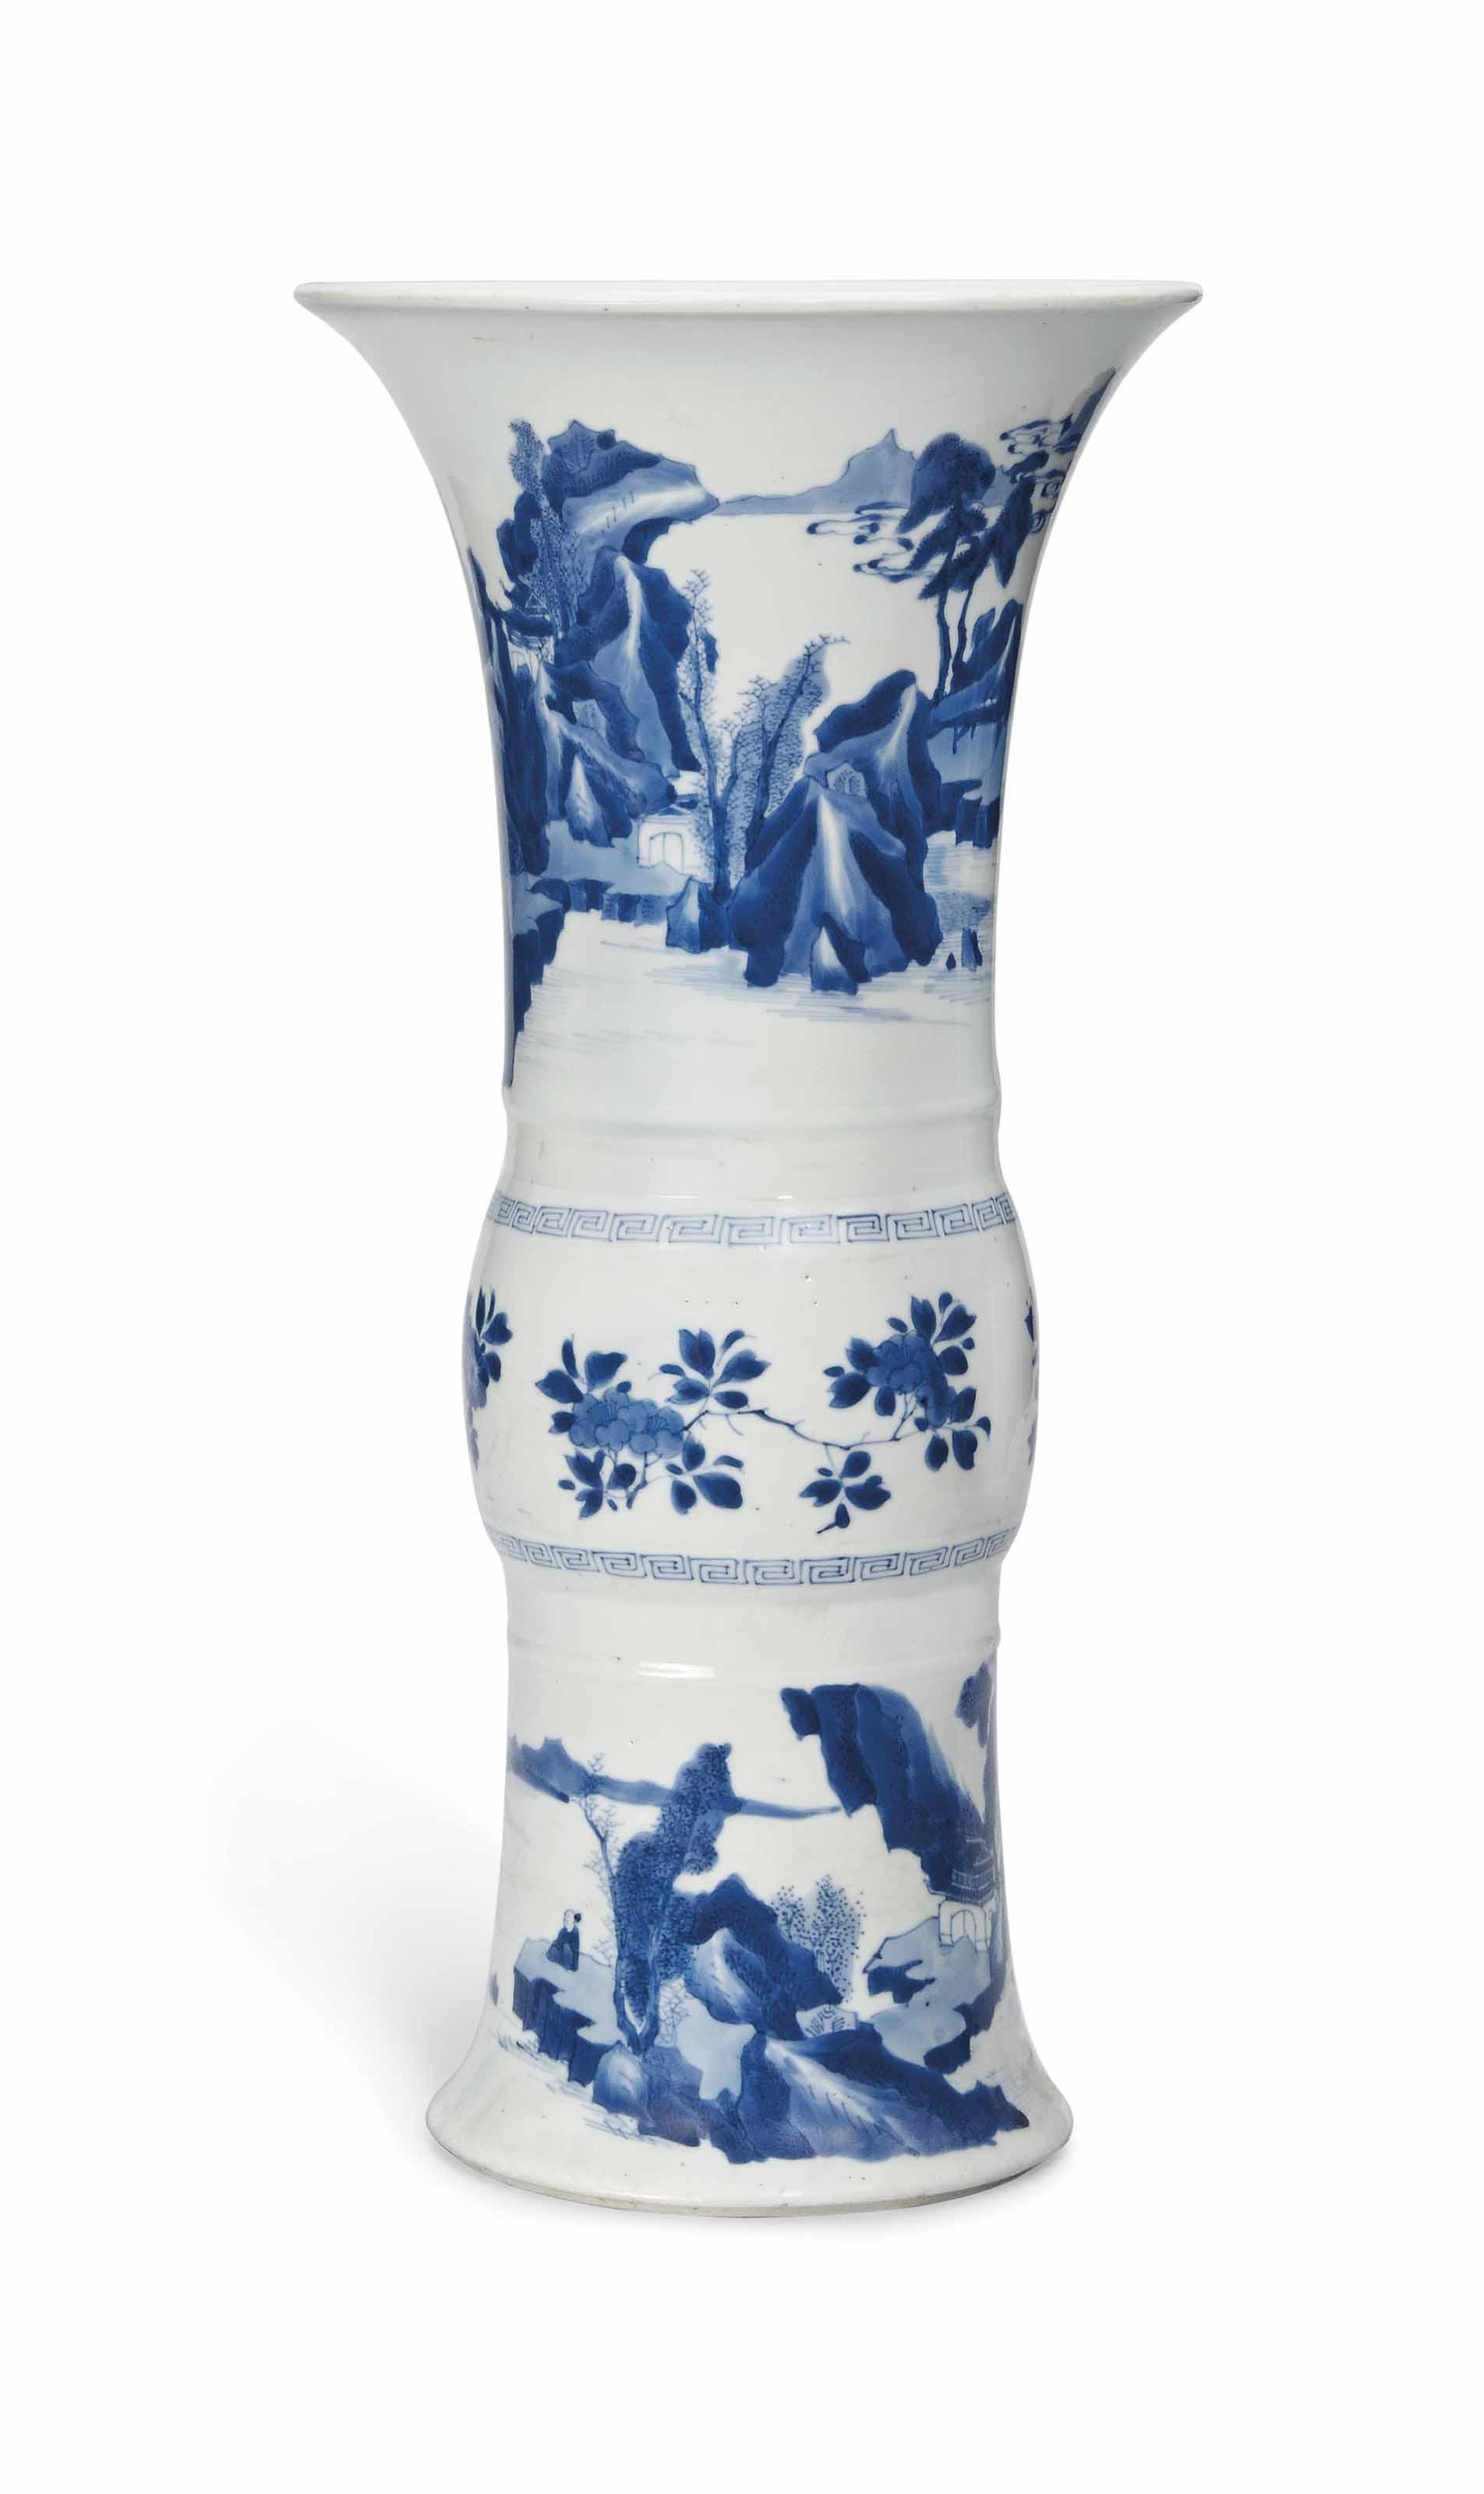 A BLUE AND WHITE VASE, GU